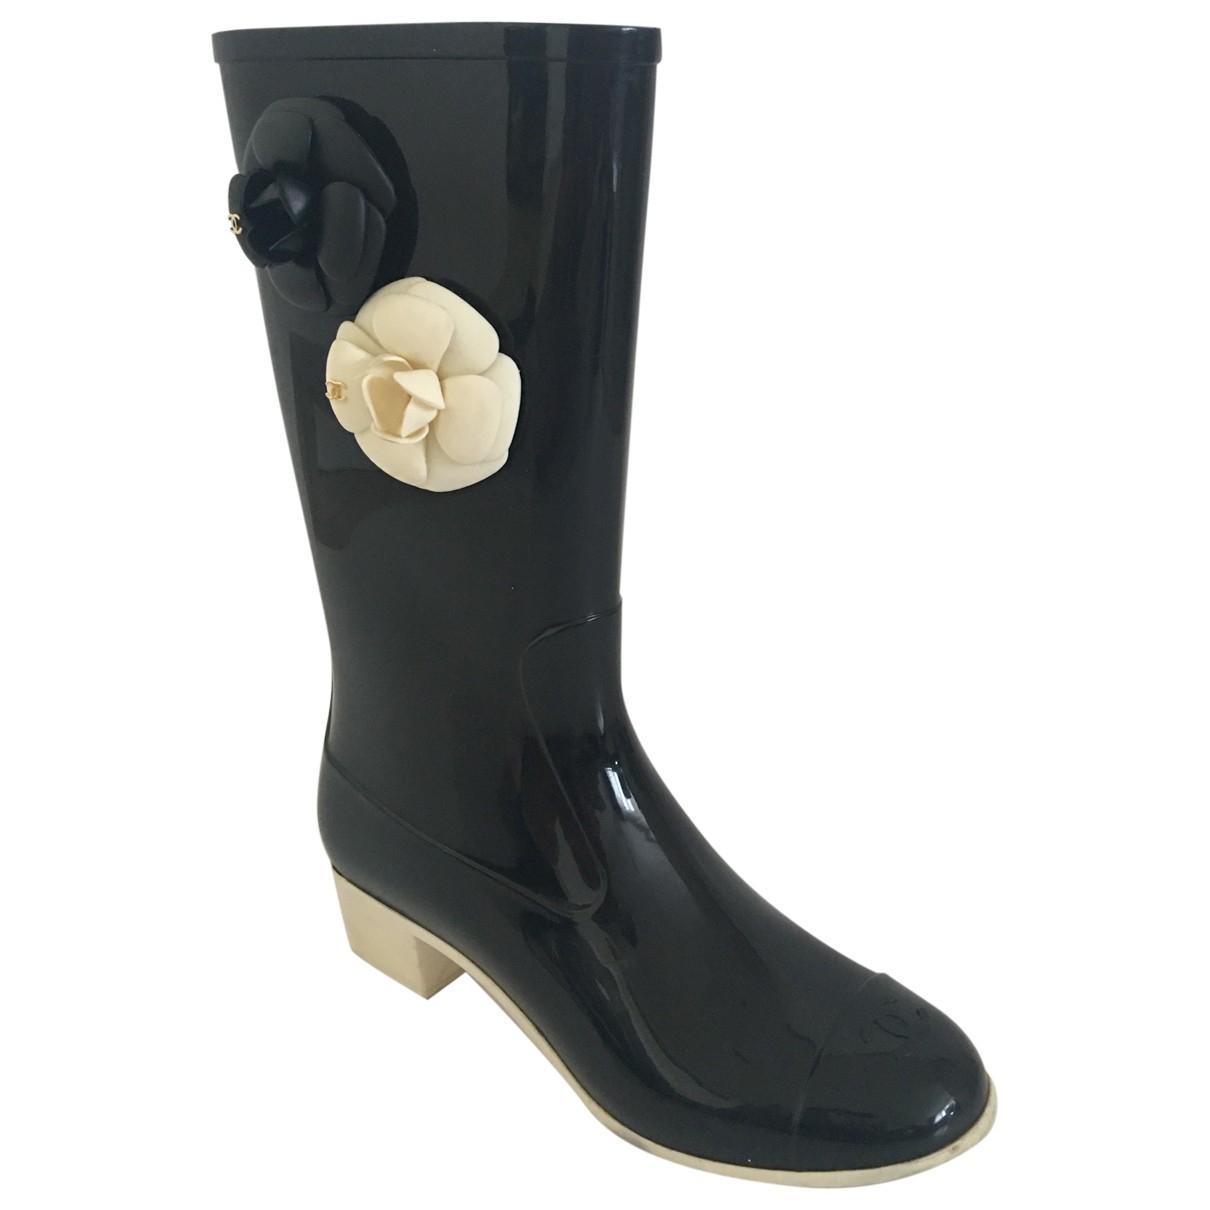 Chanel \N Black Boots for Women 40 EU